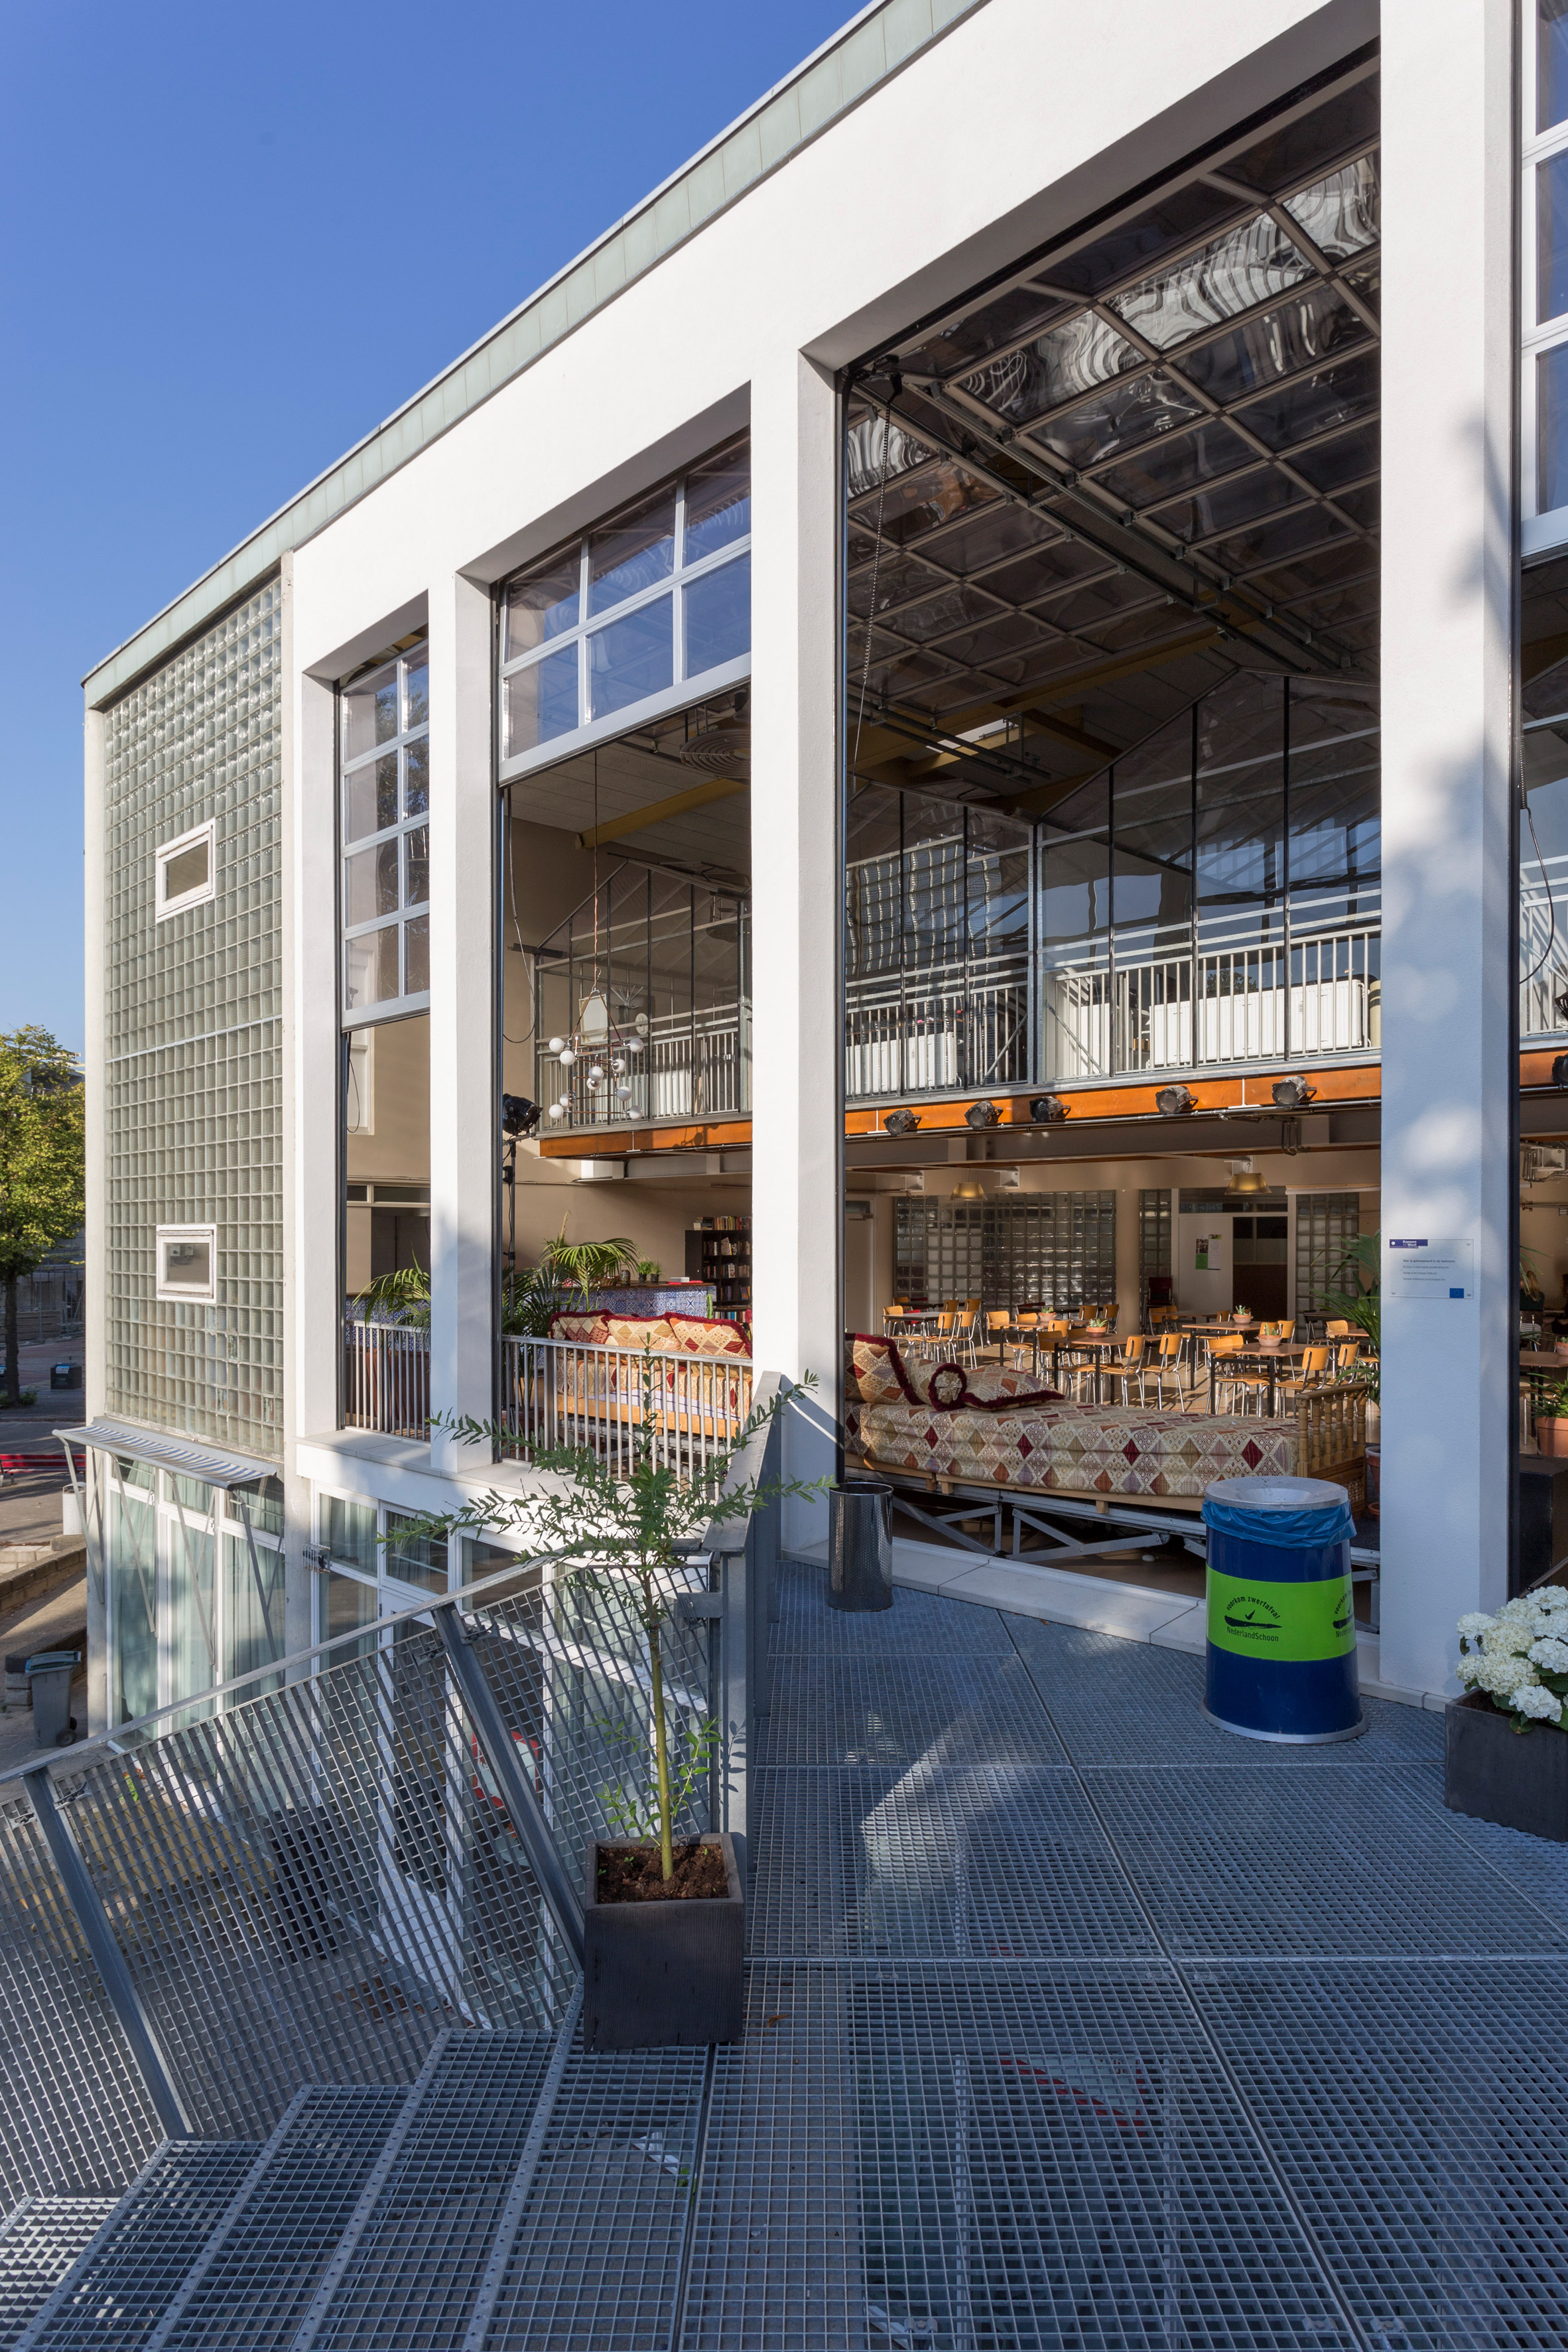 Retractable garage-style doors open Amsterdam entrepreneur hub to the elements